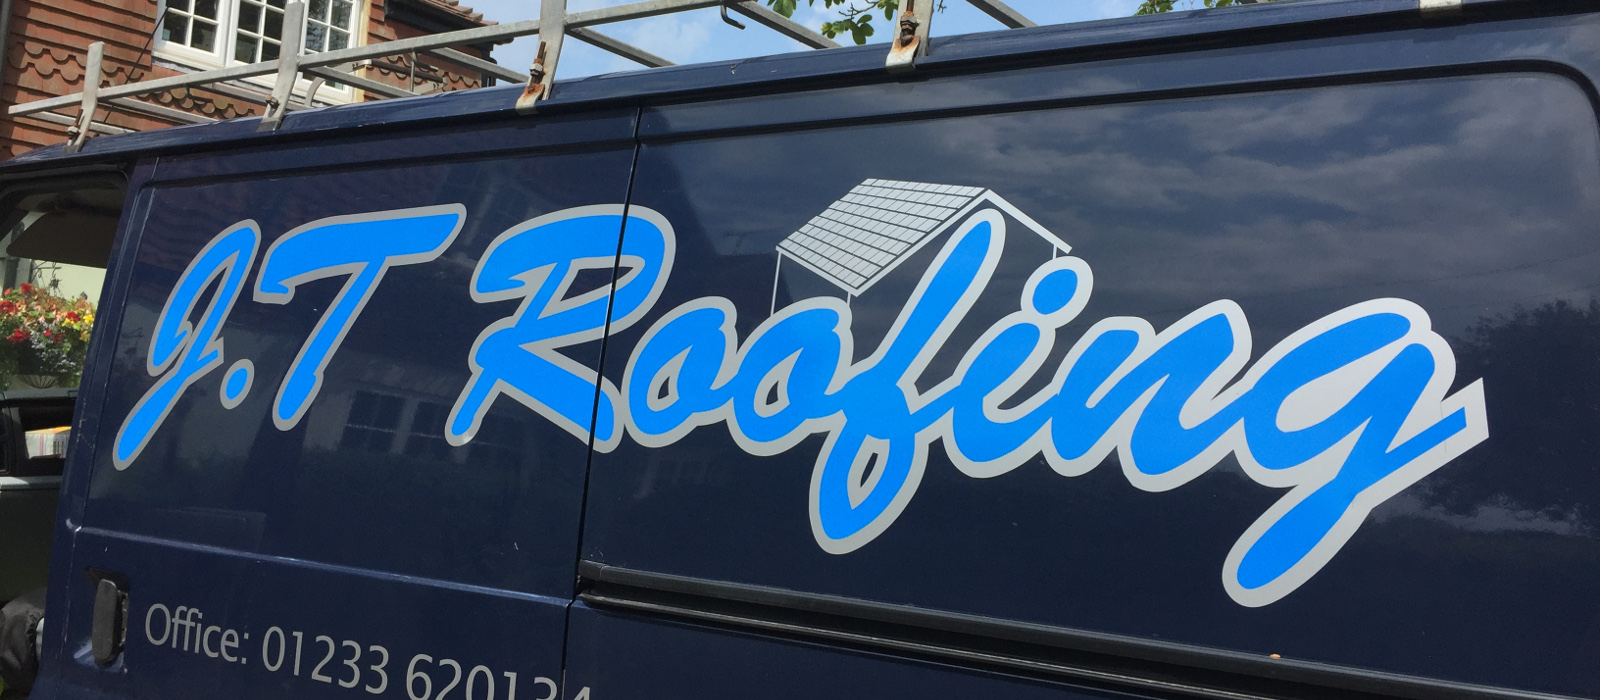 Ashford JT Roofing